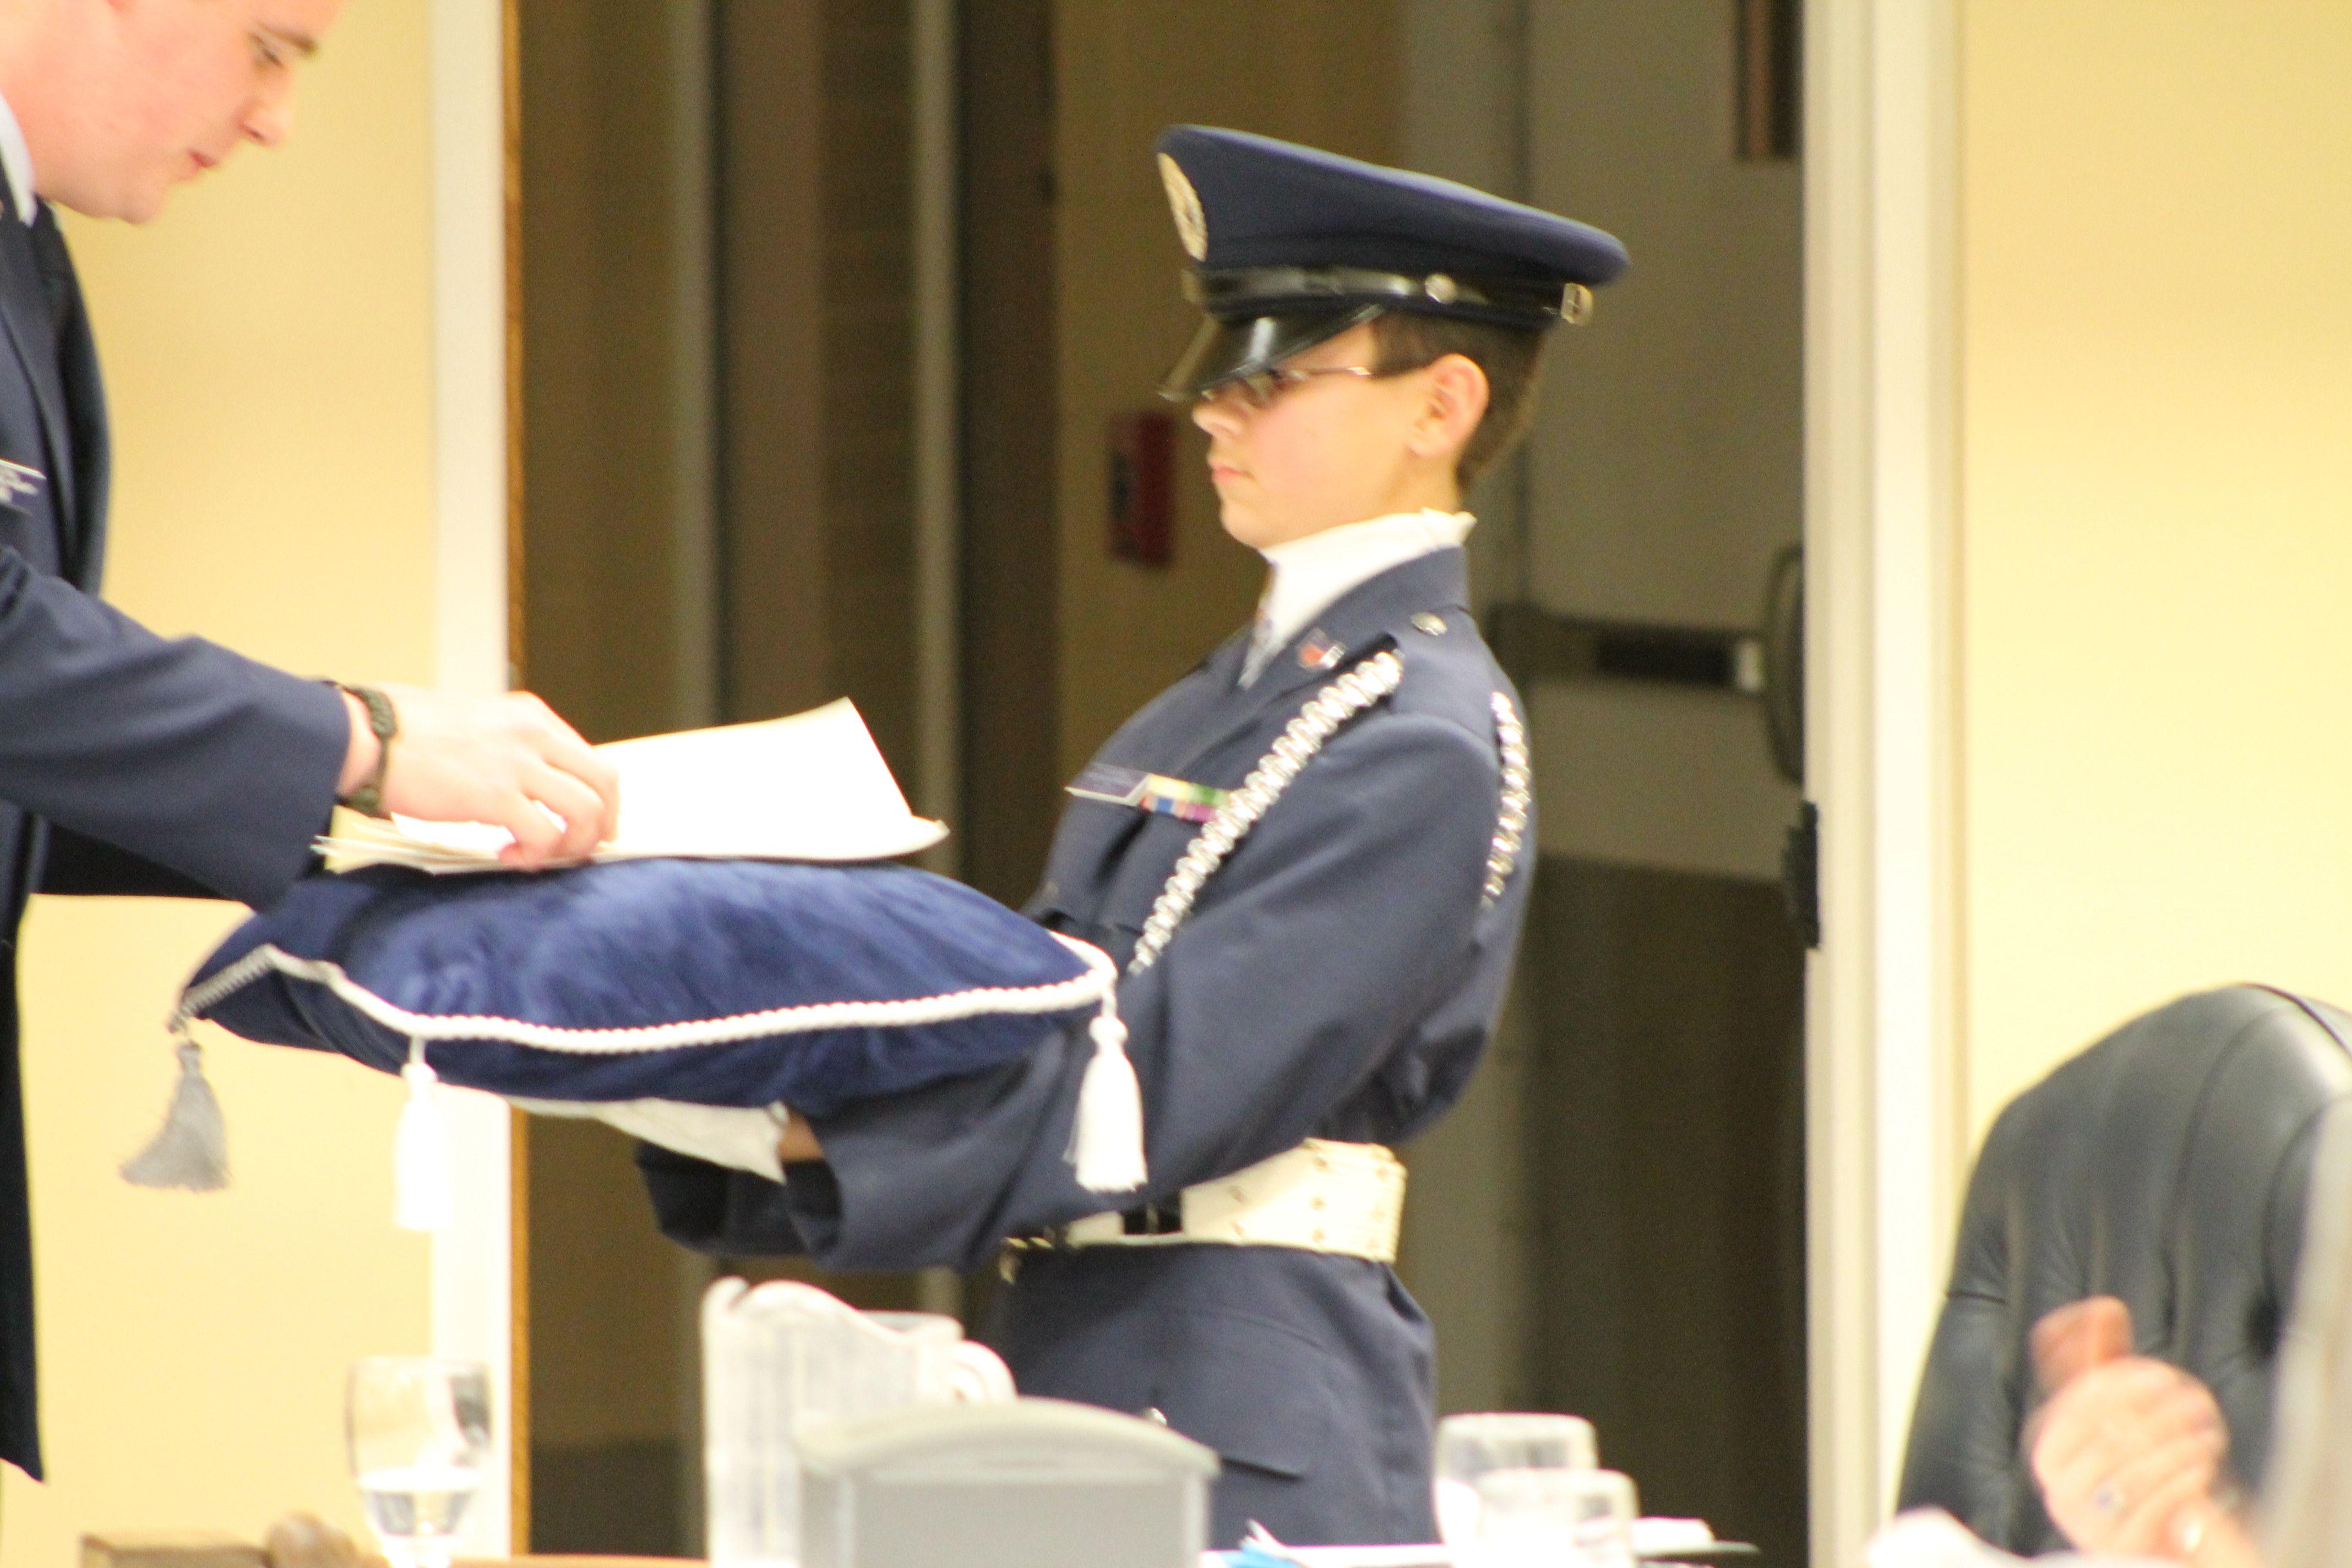 Civil Air Patrol Presentation of award by Honor Guard